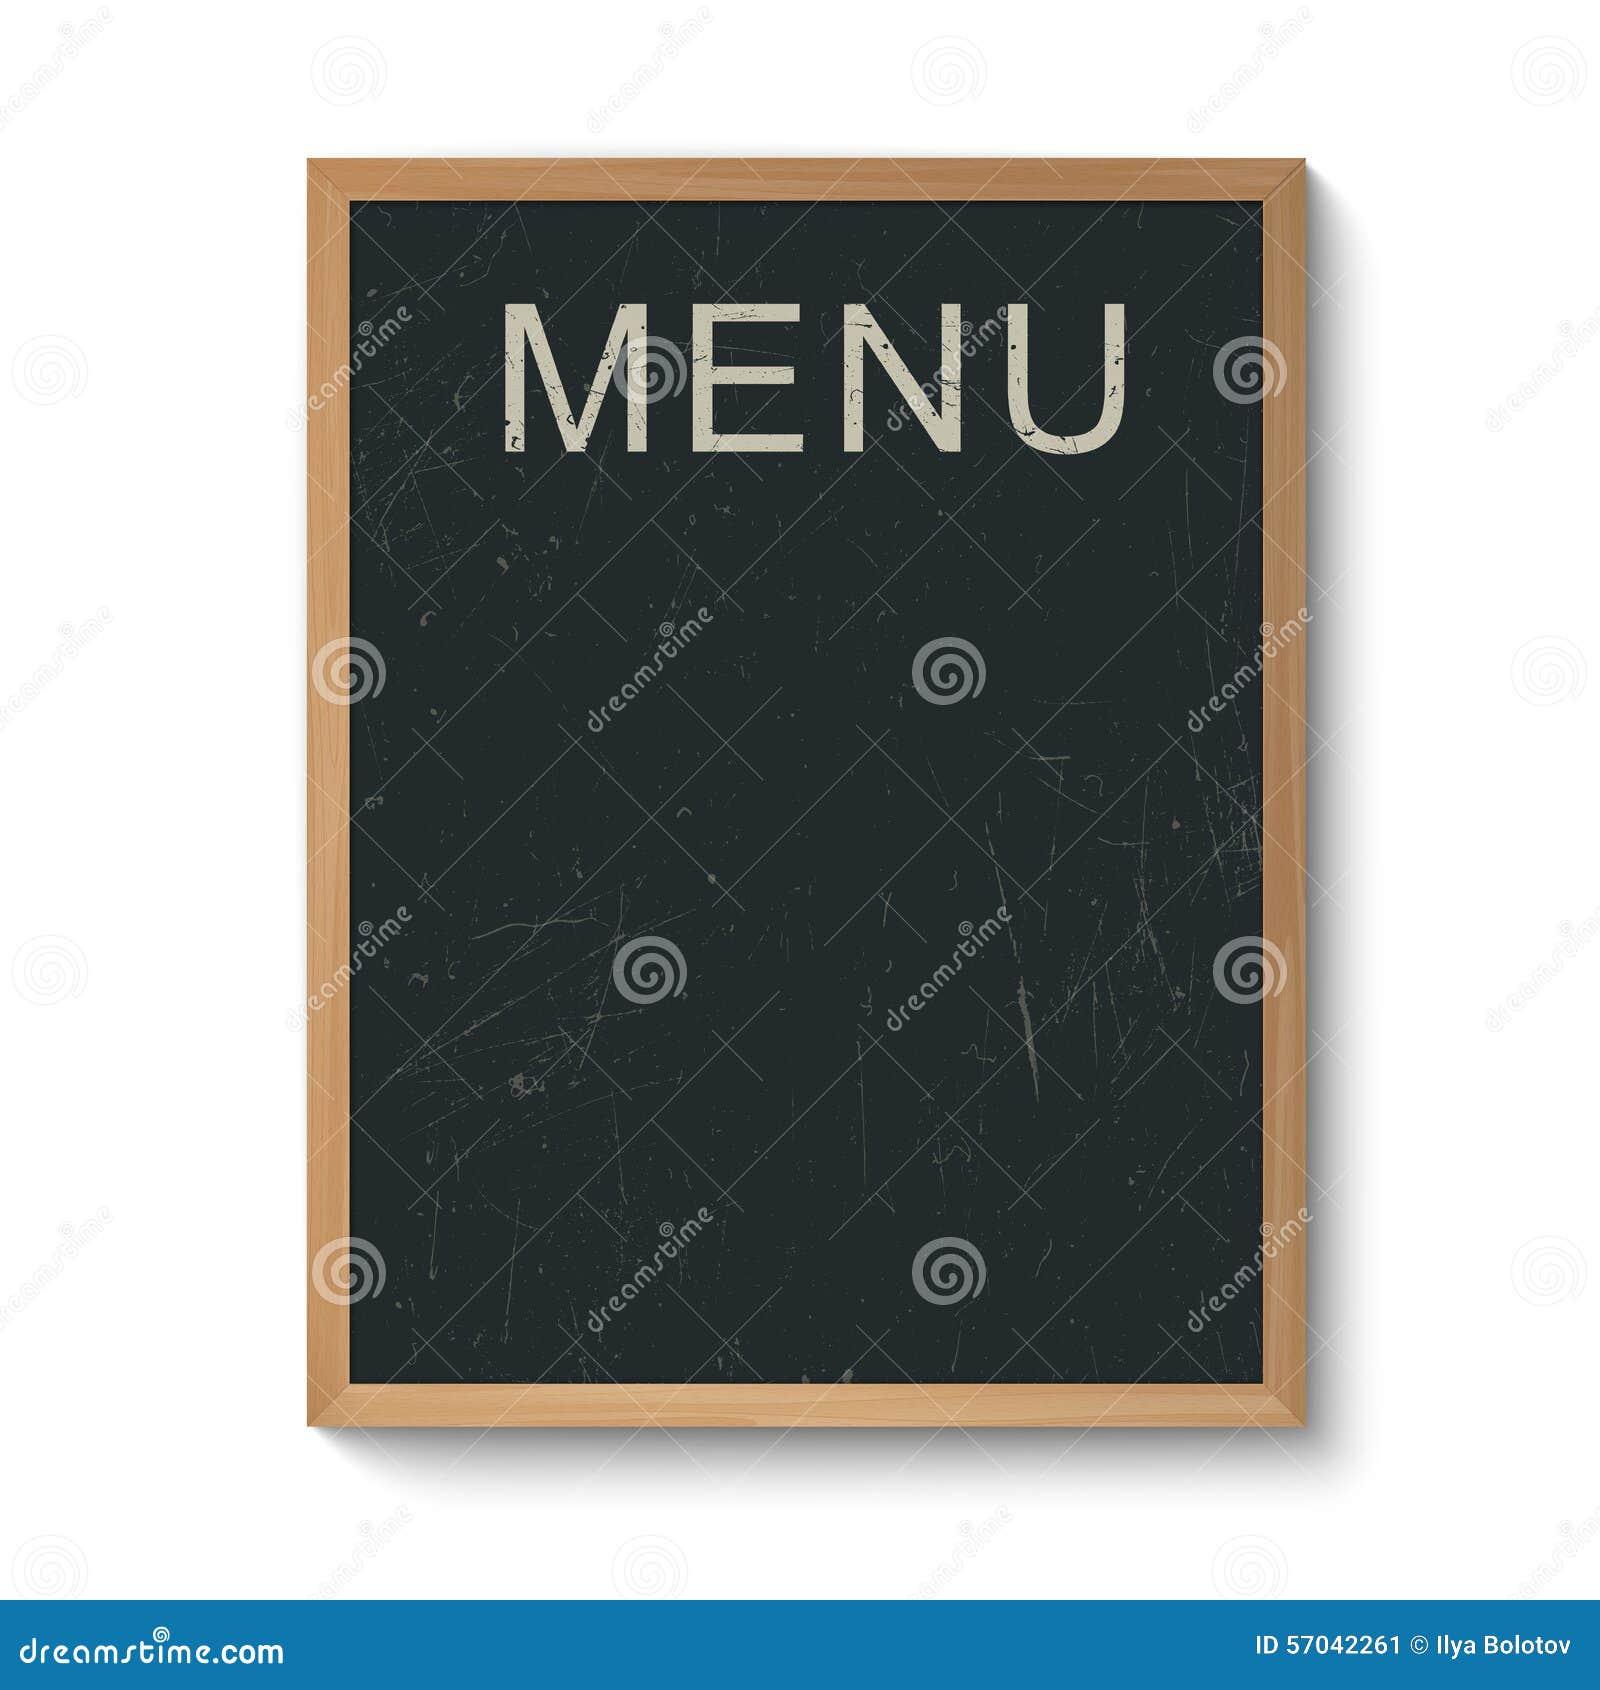 Restaurant Menu Board In A Wooden Frame Stock Vector